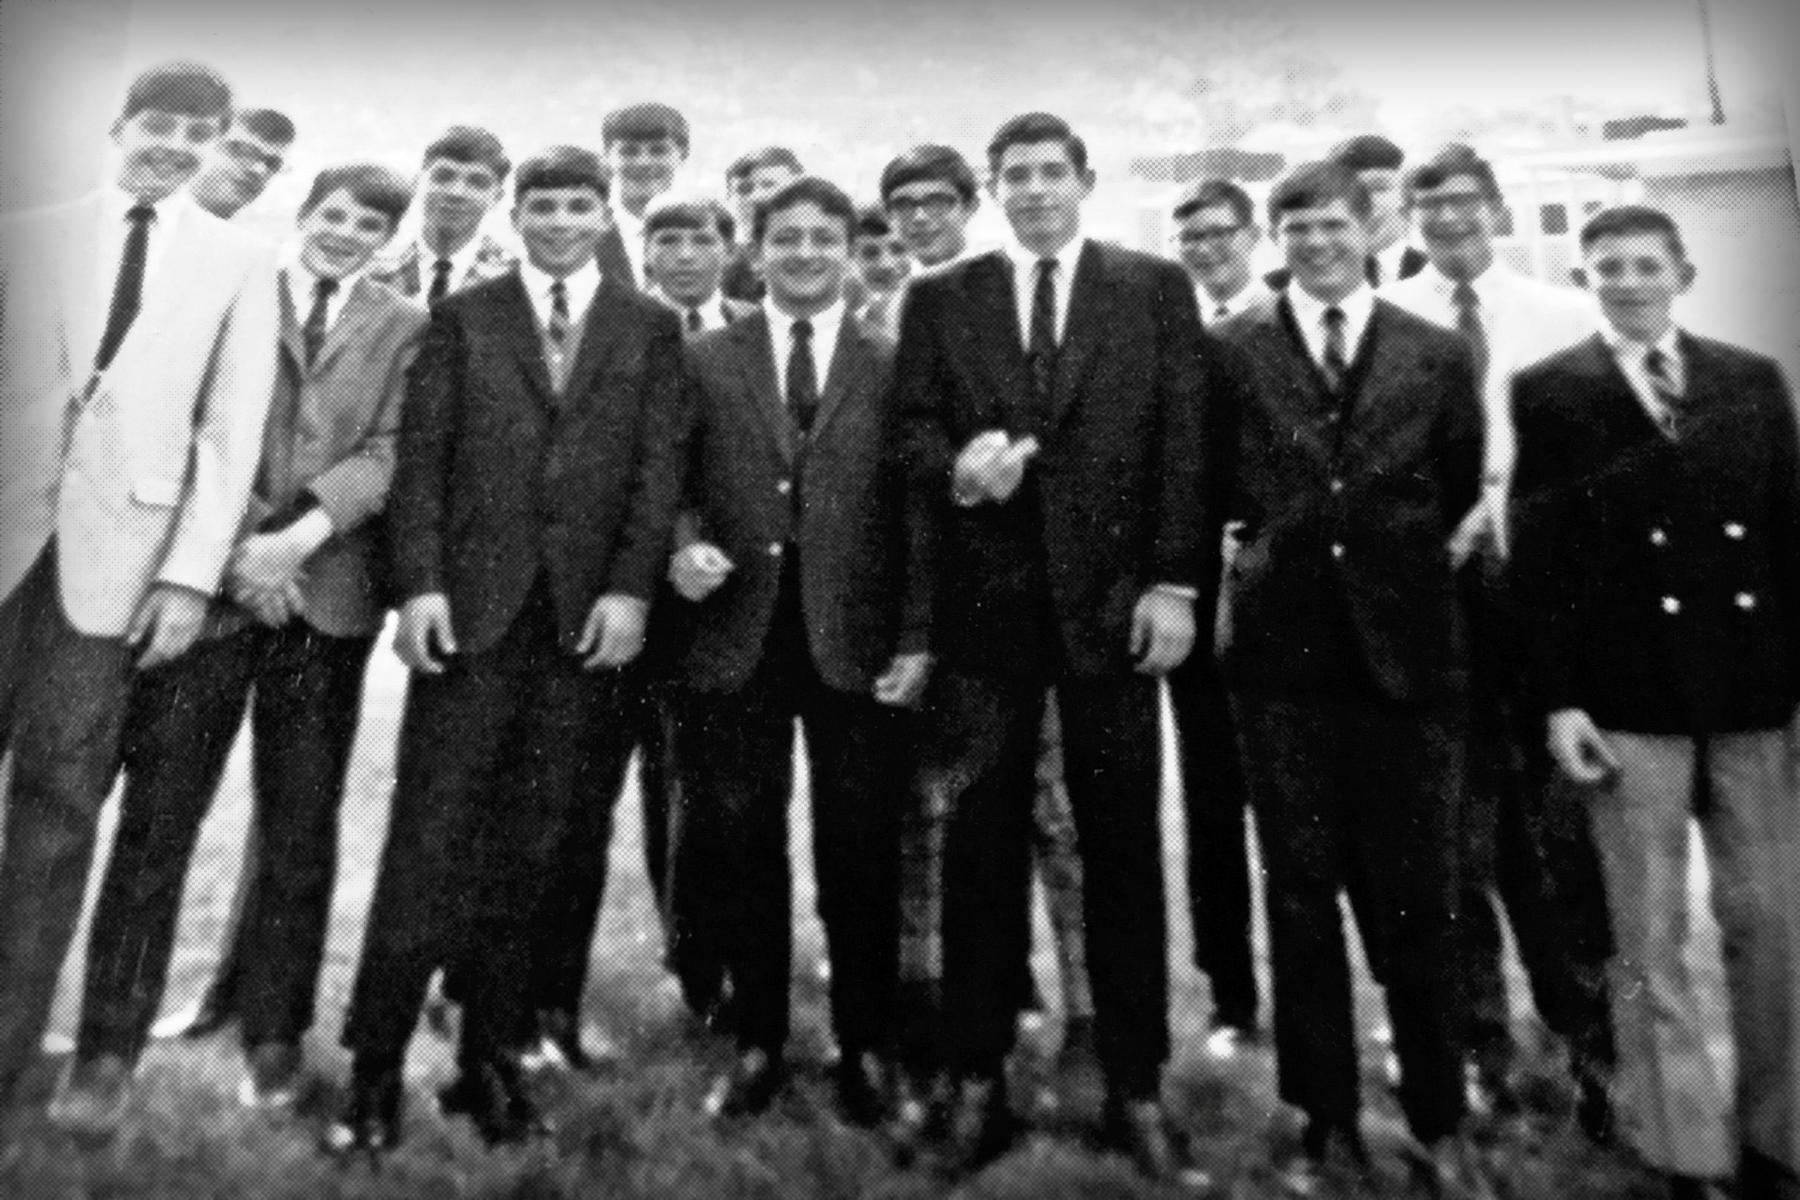 Class of 68